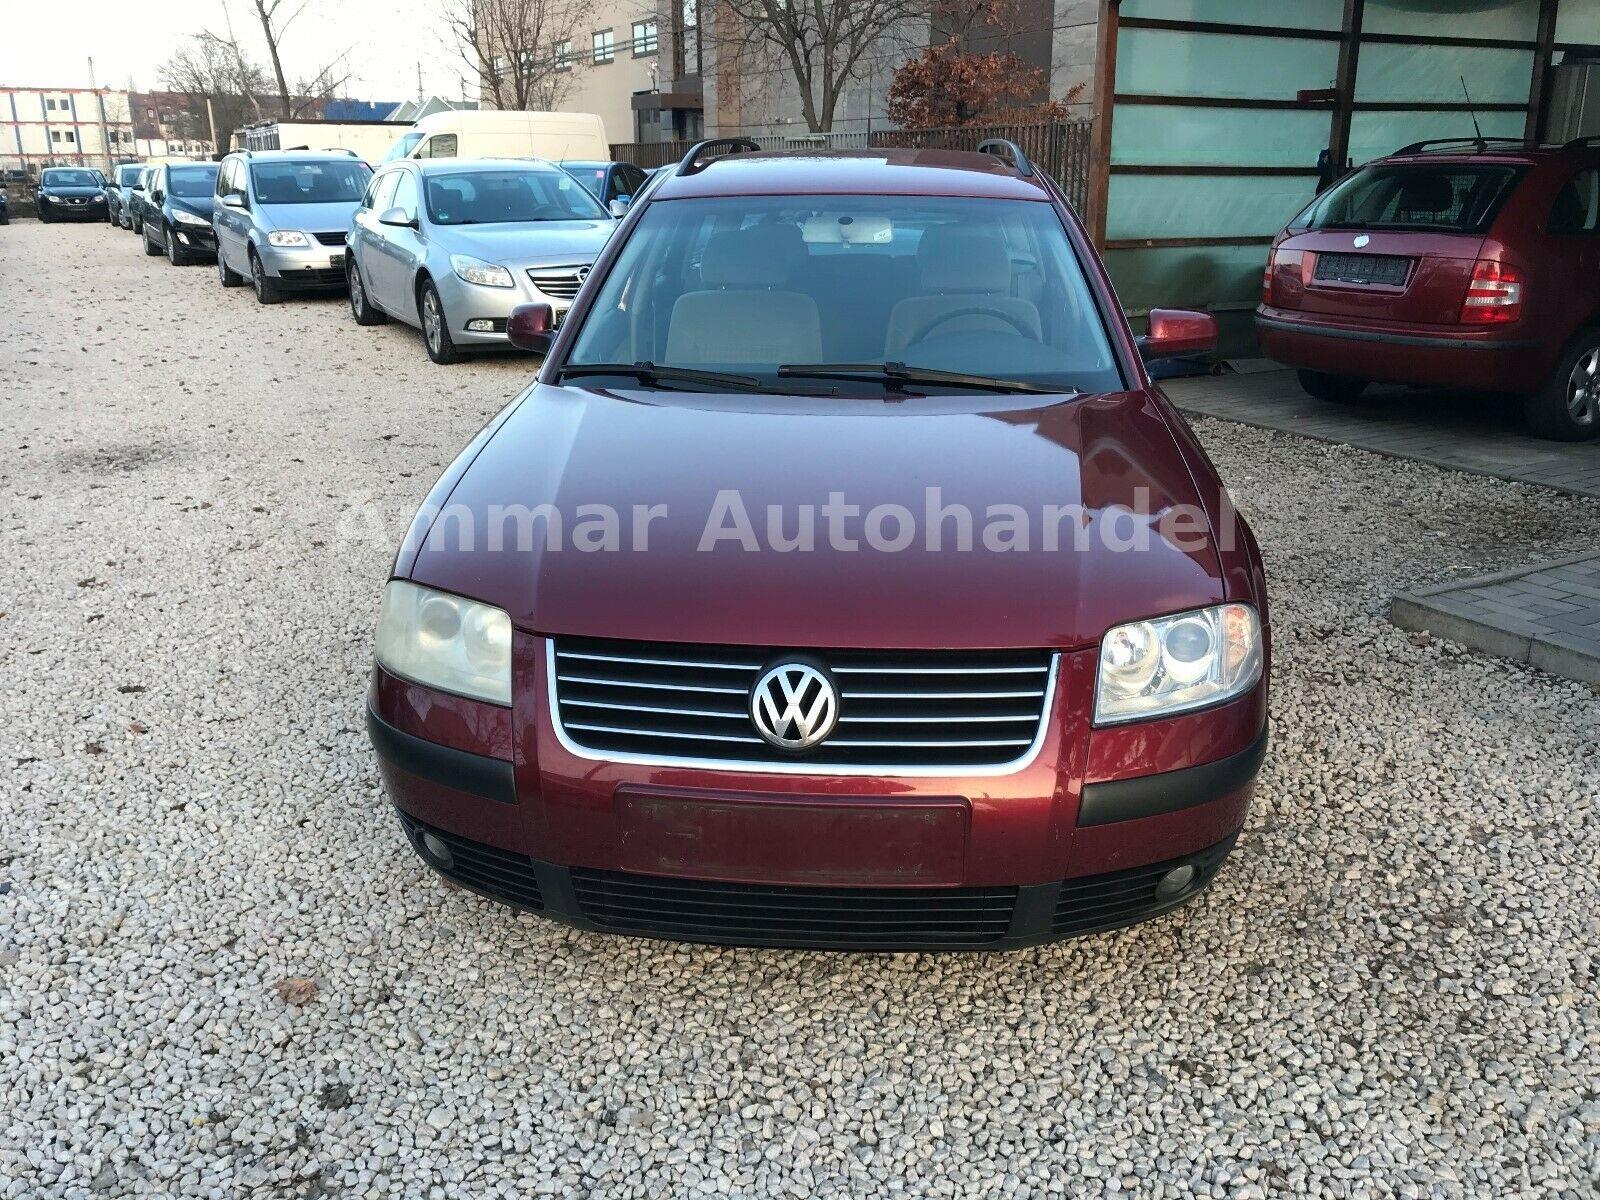 VW Passat Variant Comfortline